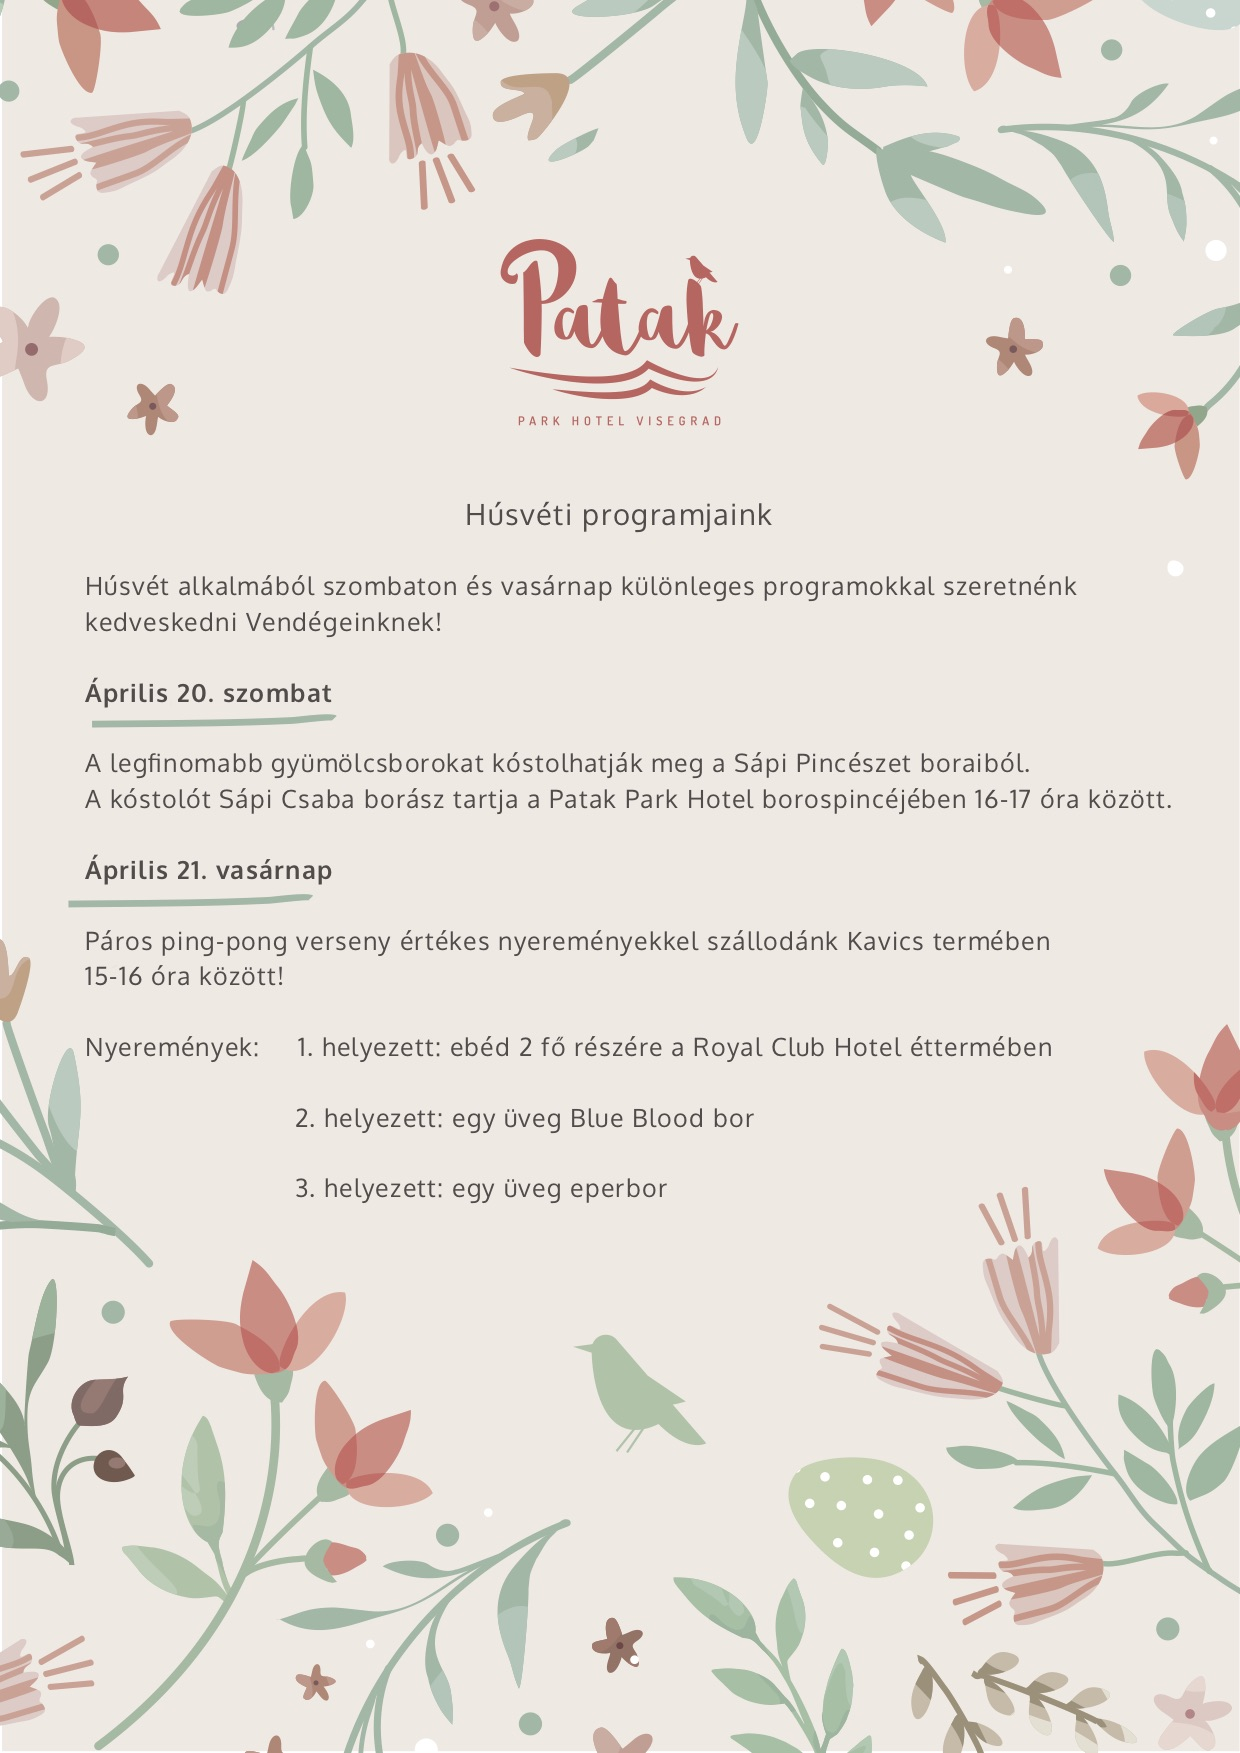 patak_easter_2019